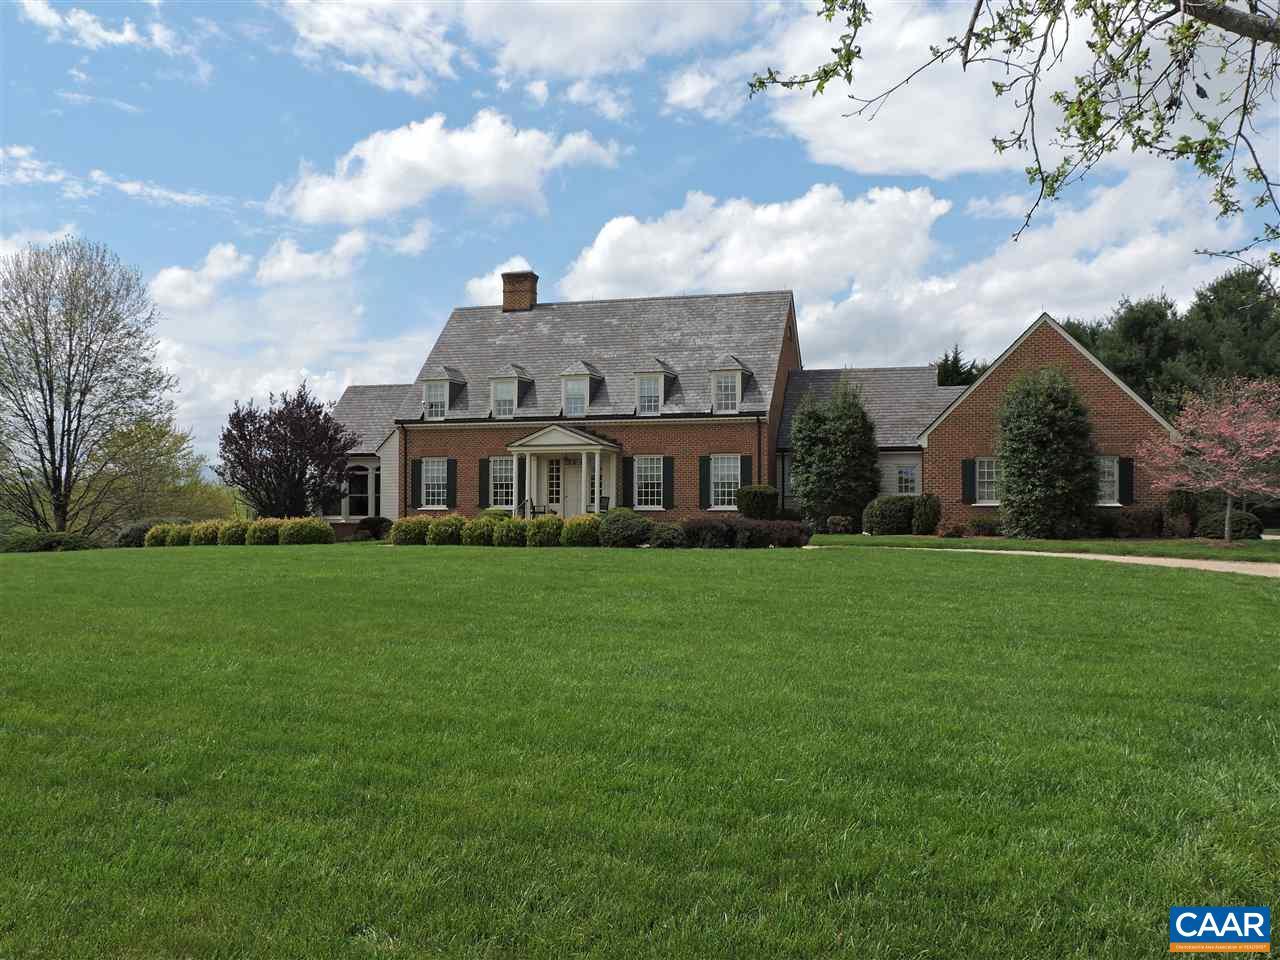 Property for sale at 1100 INGLECRESS DR, Charlottesville,  VA 22901